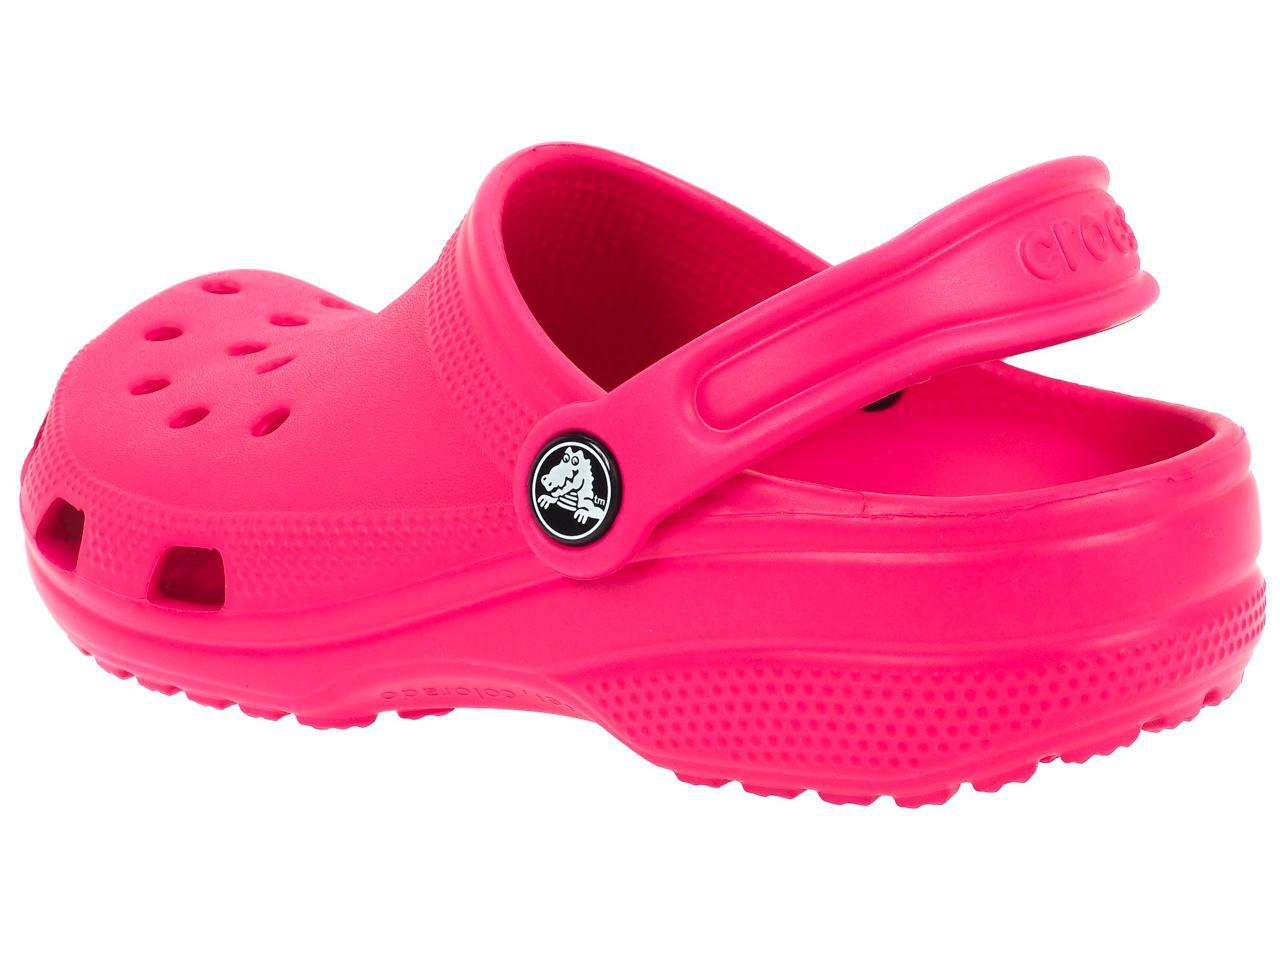 Sabots-Crocs-Classic-candy-pink-kid-Rose-77832-Neuf miniature 2